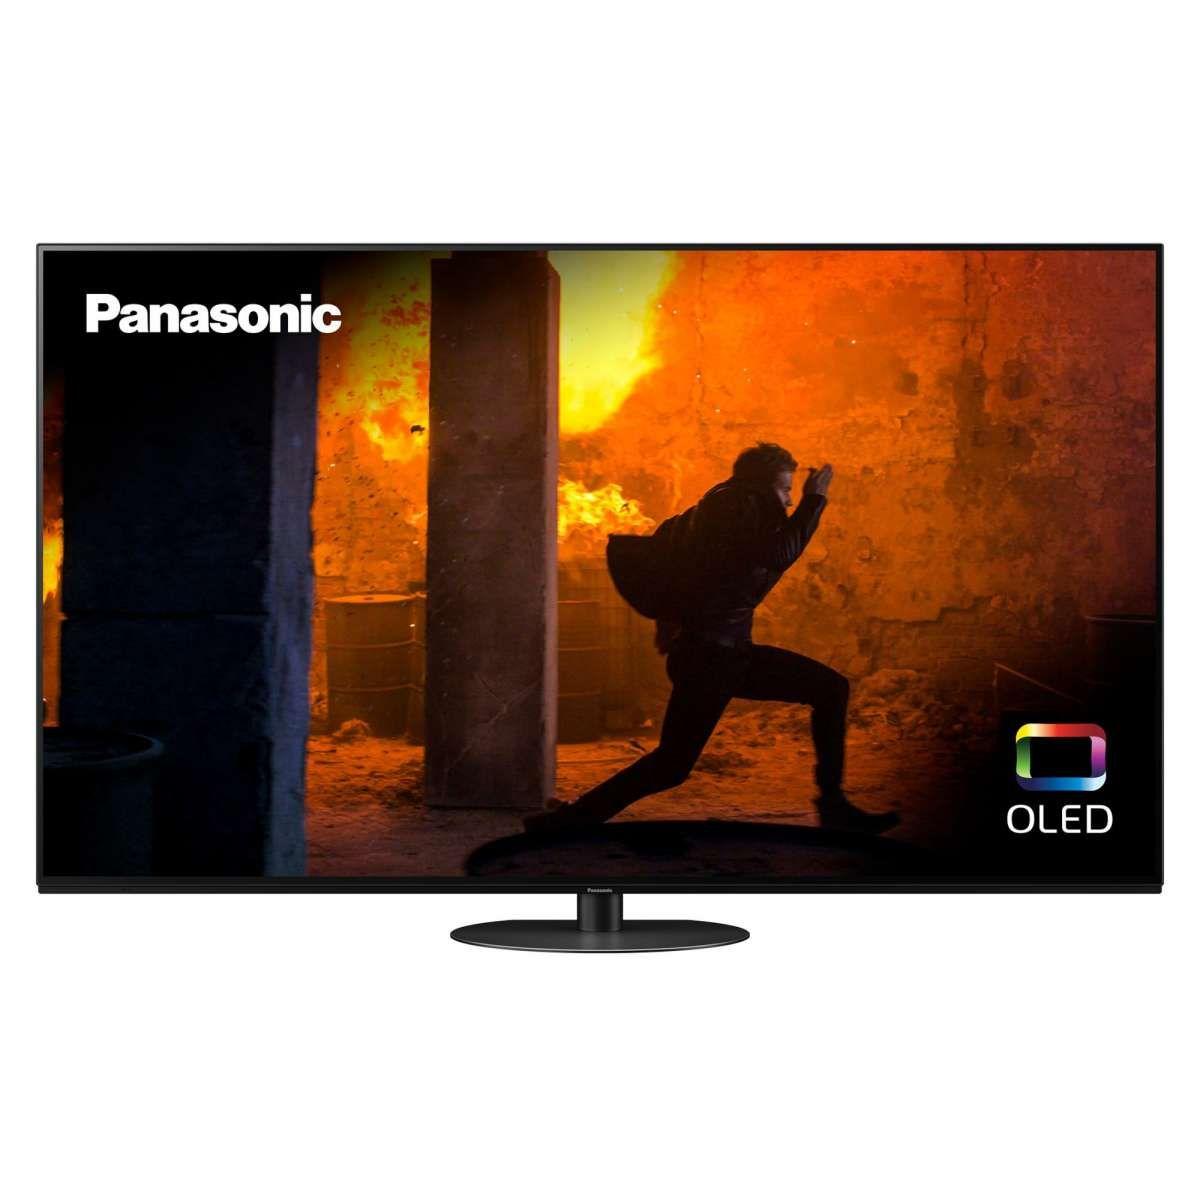 "Panasonic TX-55HZ980B 55"" 4K HDR Dolby Vision Master OLED TV + 5yr Warranty (£16 TCB) - £999 with code @ Hughes"